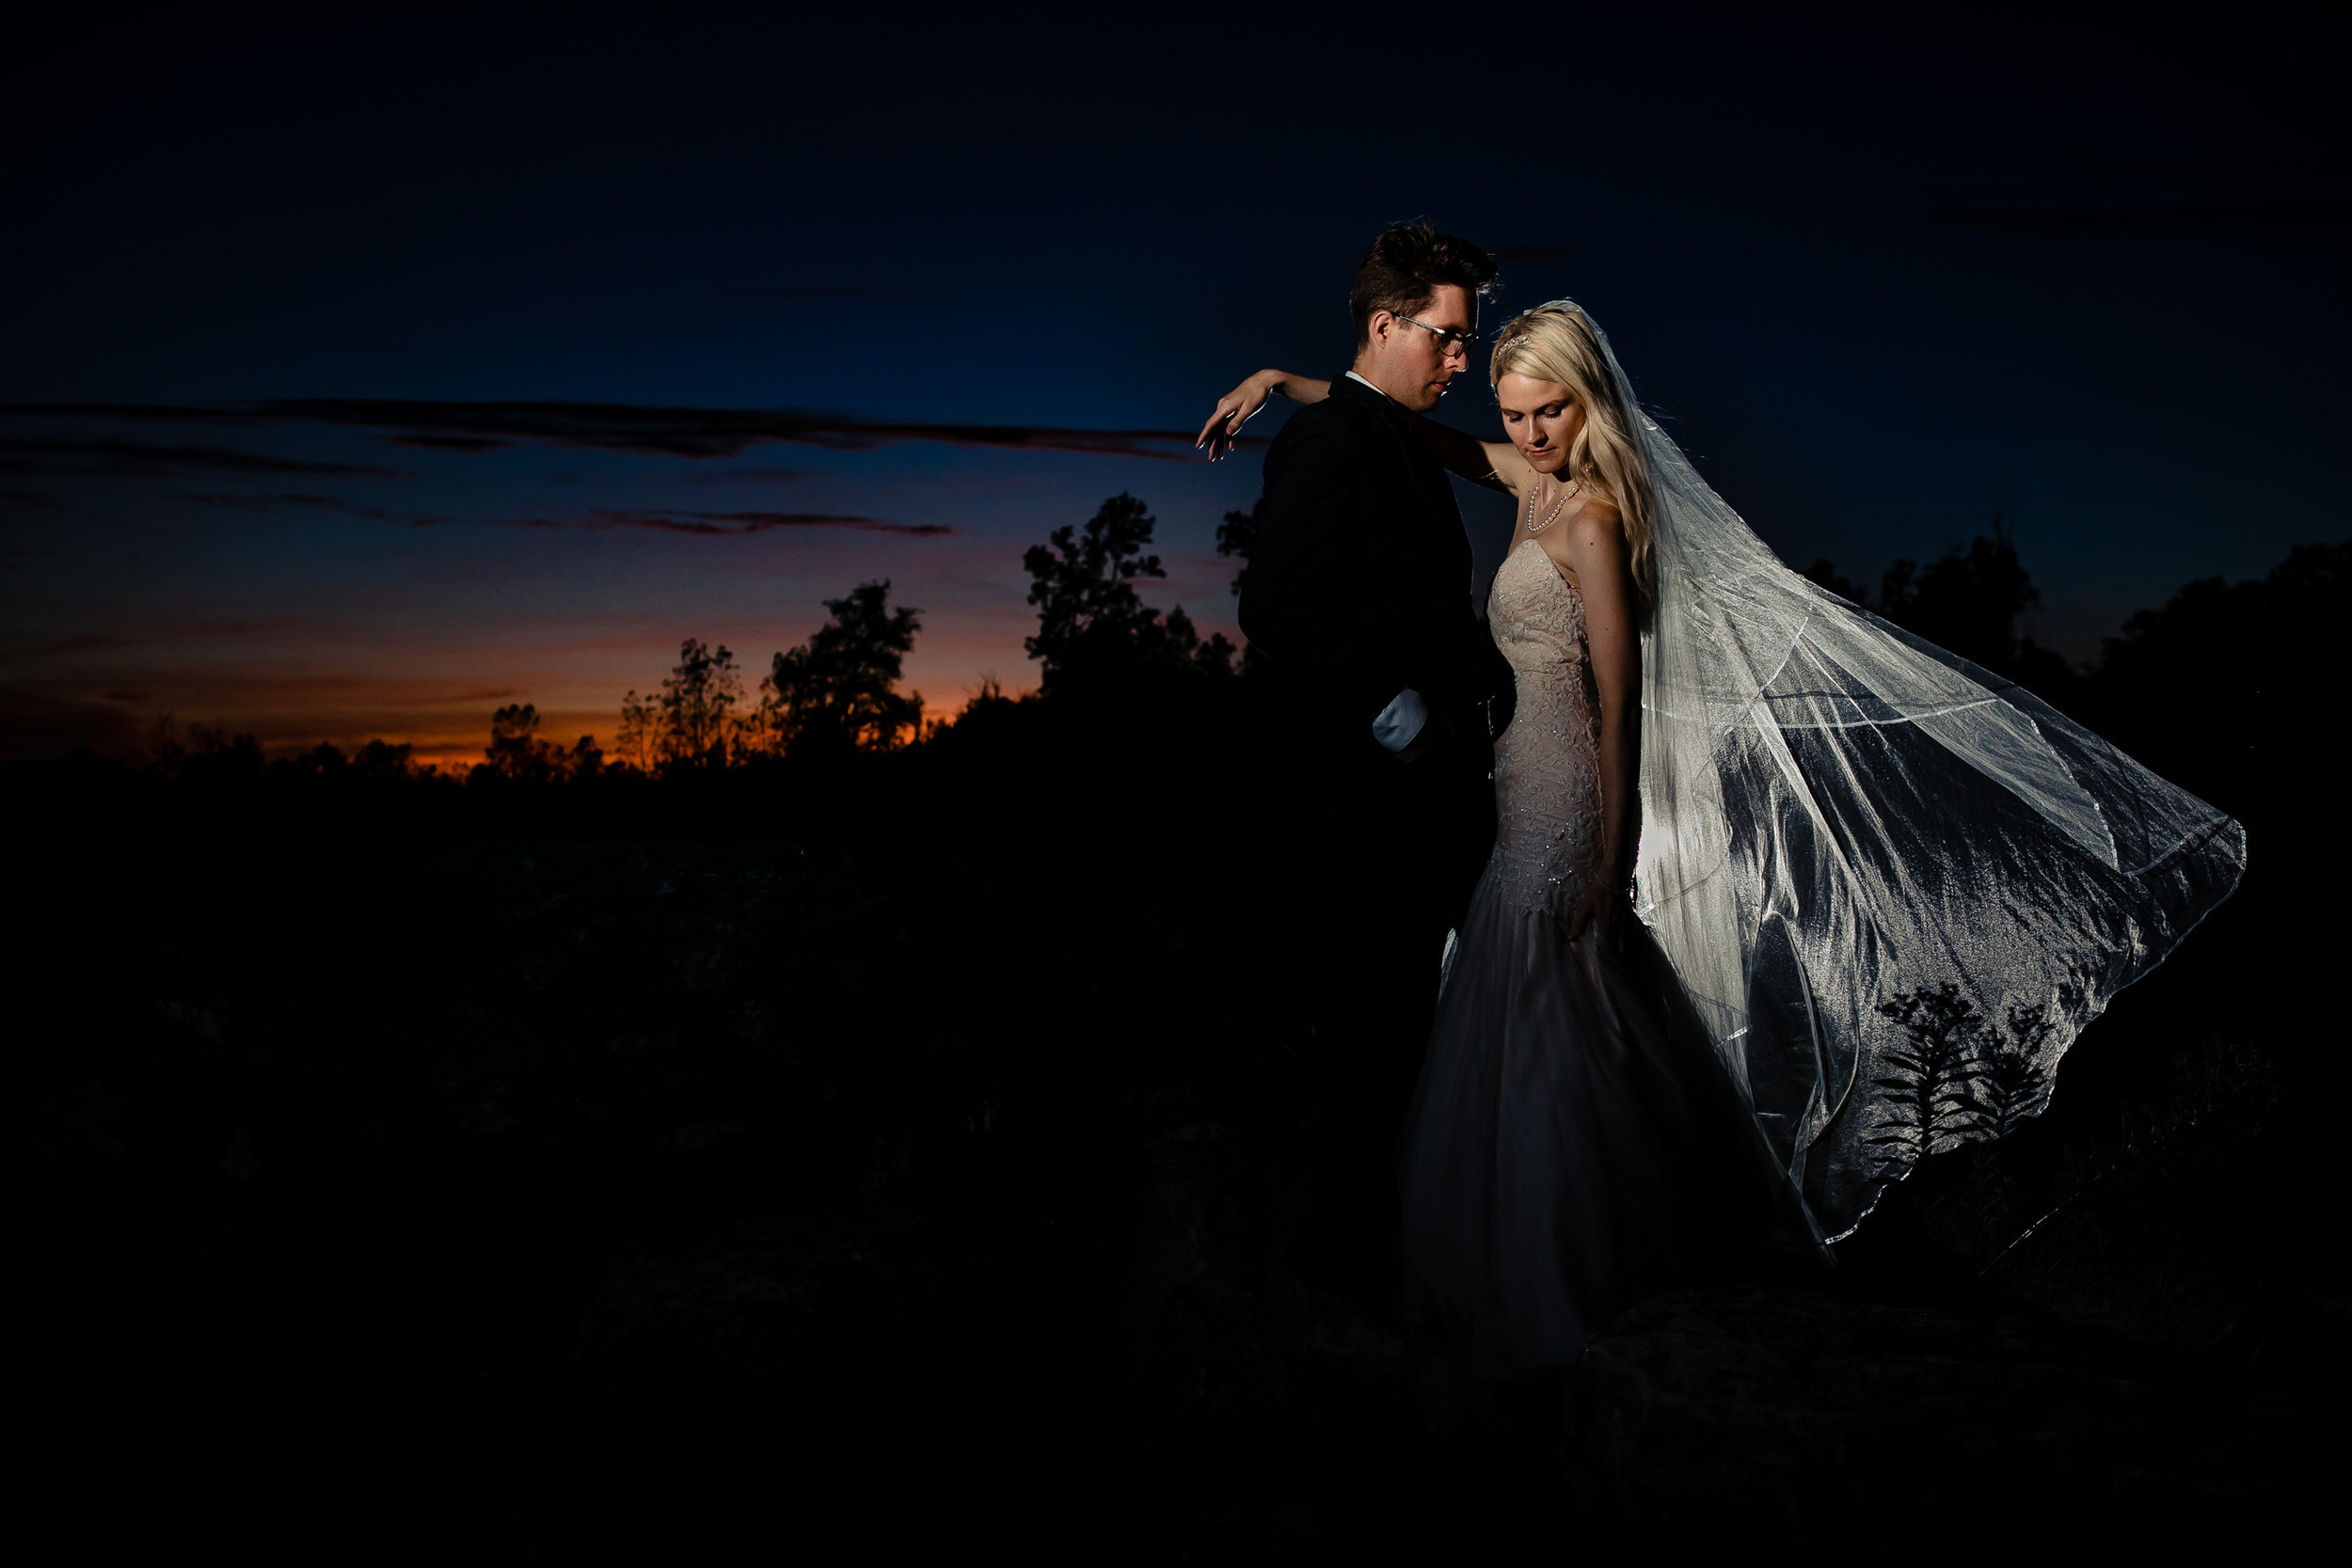 Bride and Groom Sunset Quarry-2.jpg